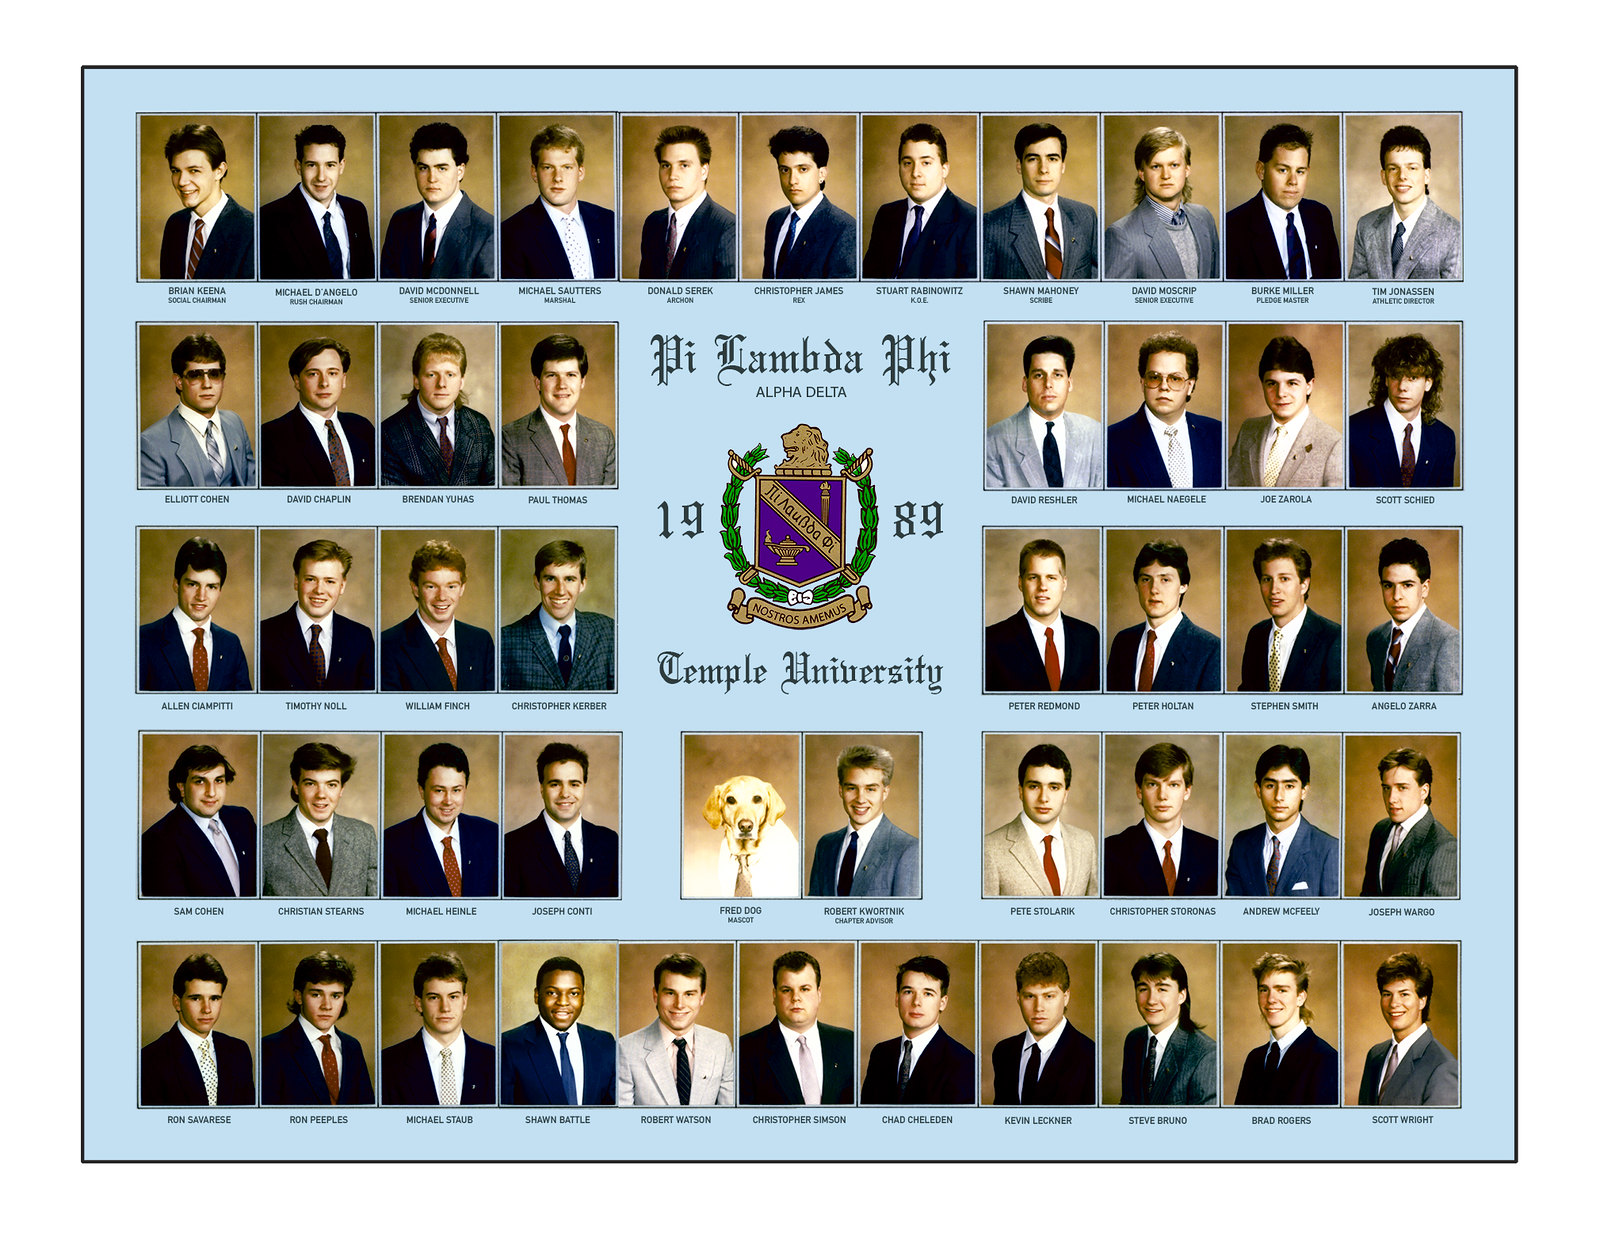 1989 composite Flickr